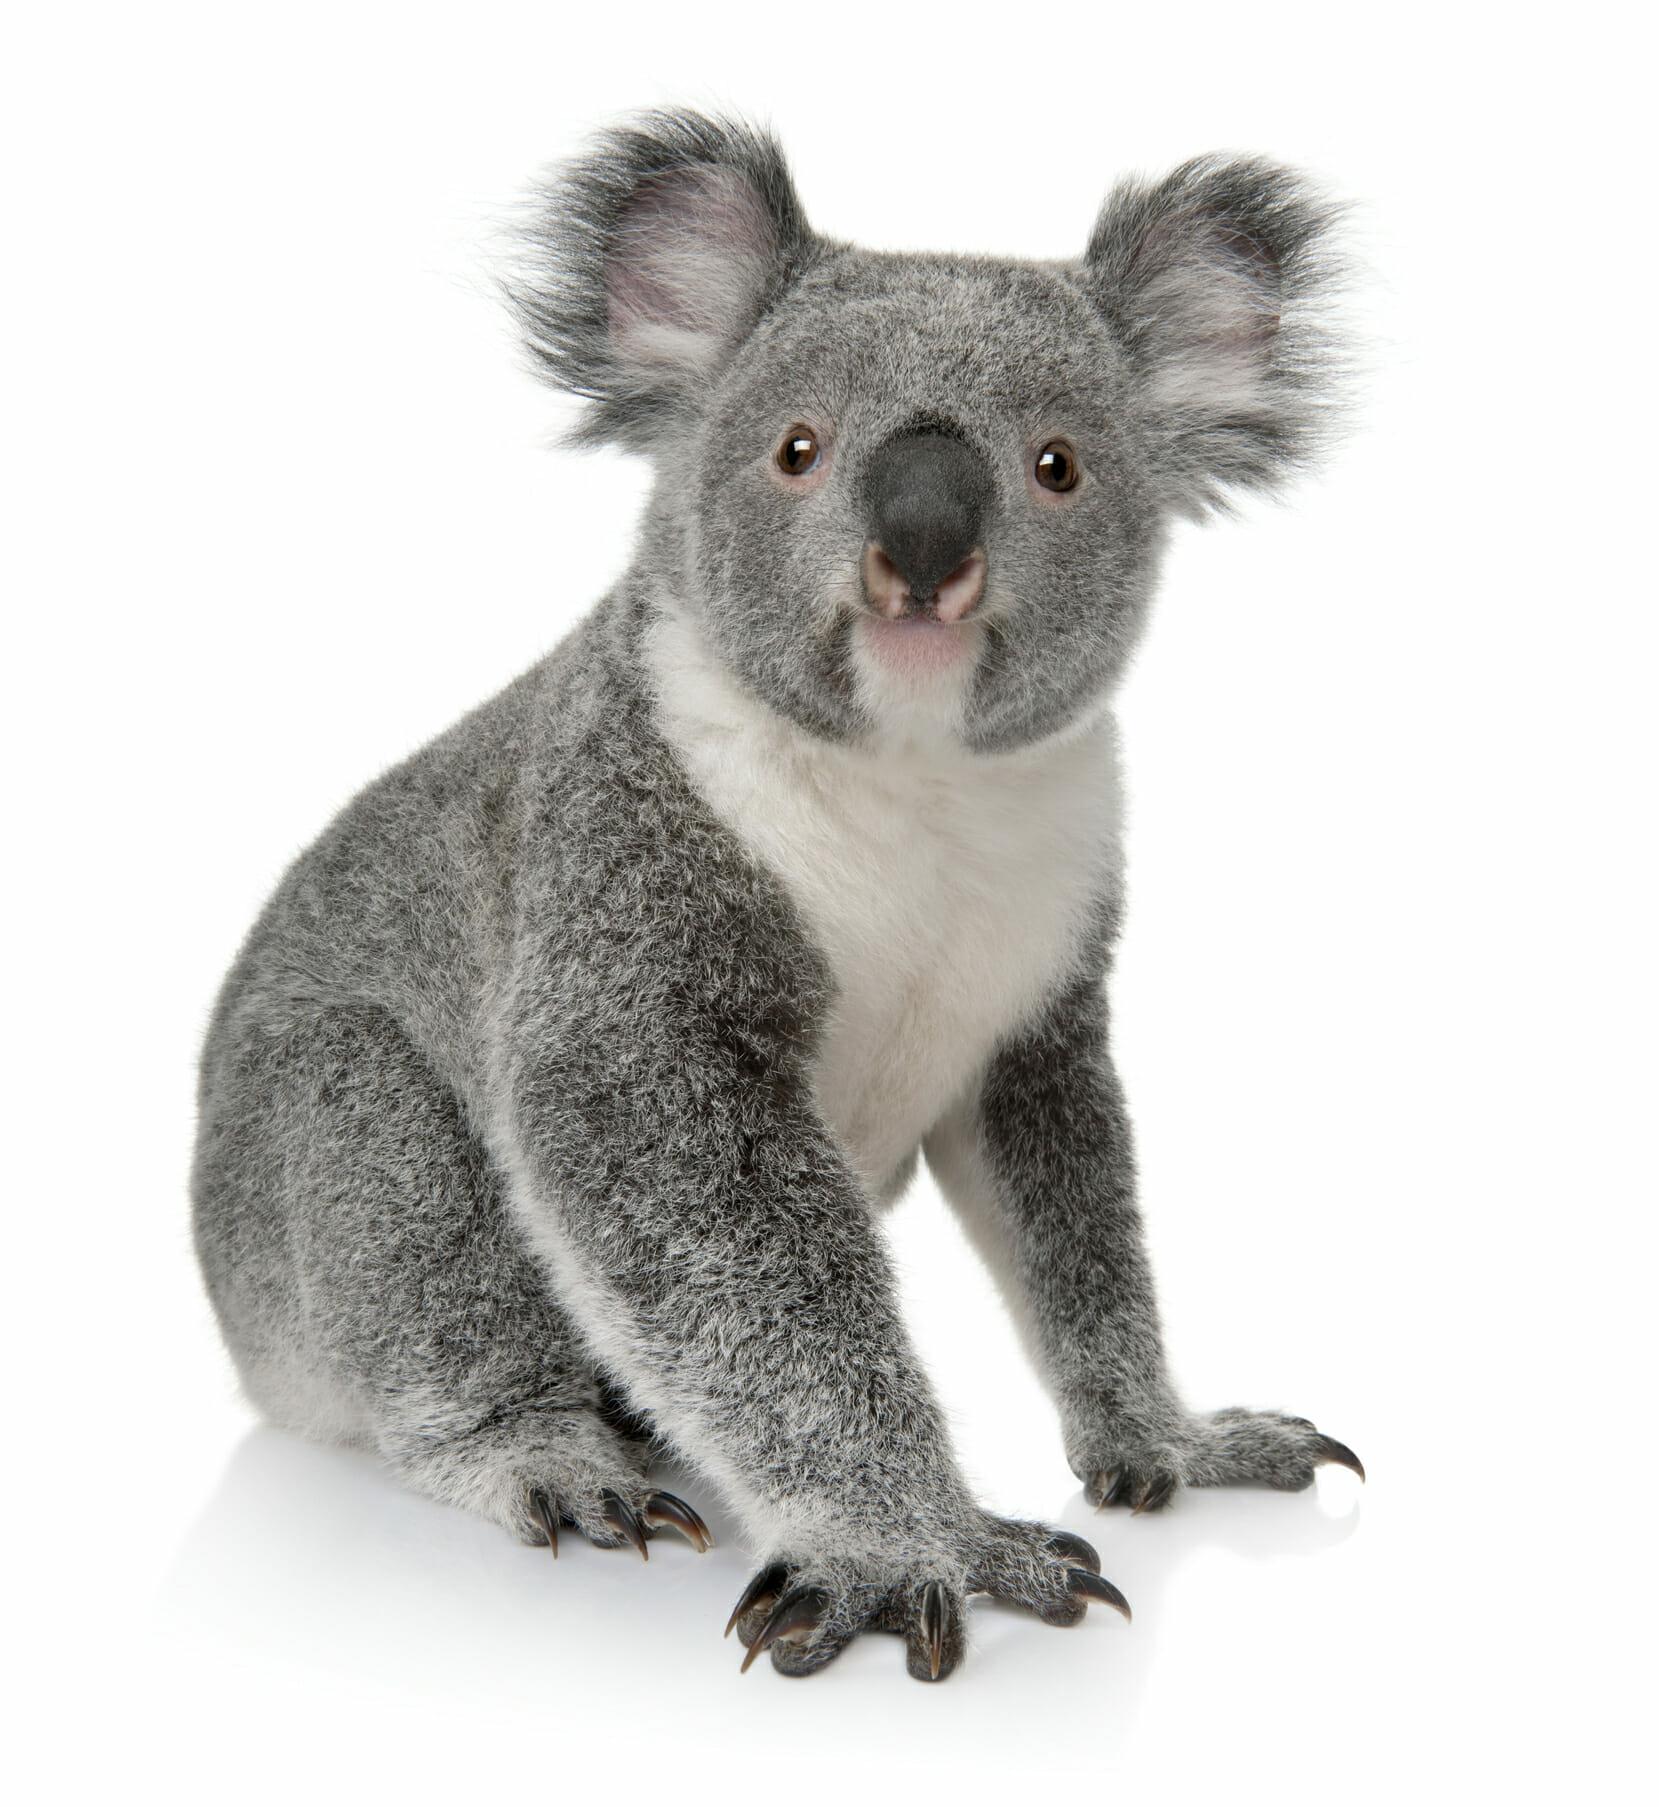 http://www.dreamstime.com/stock-images-young-koala-phascolarctos-cinereus-14-months-old-image13665394